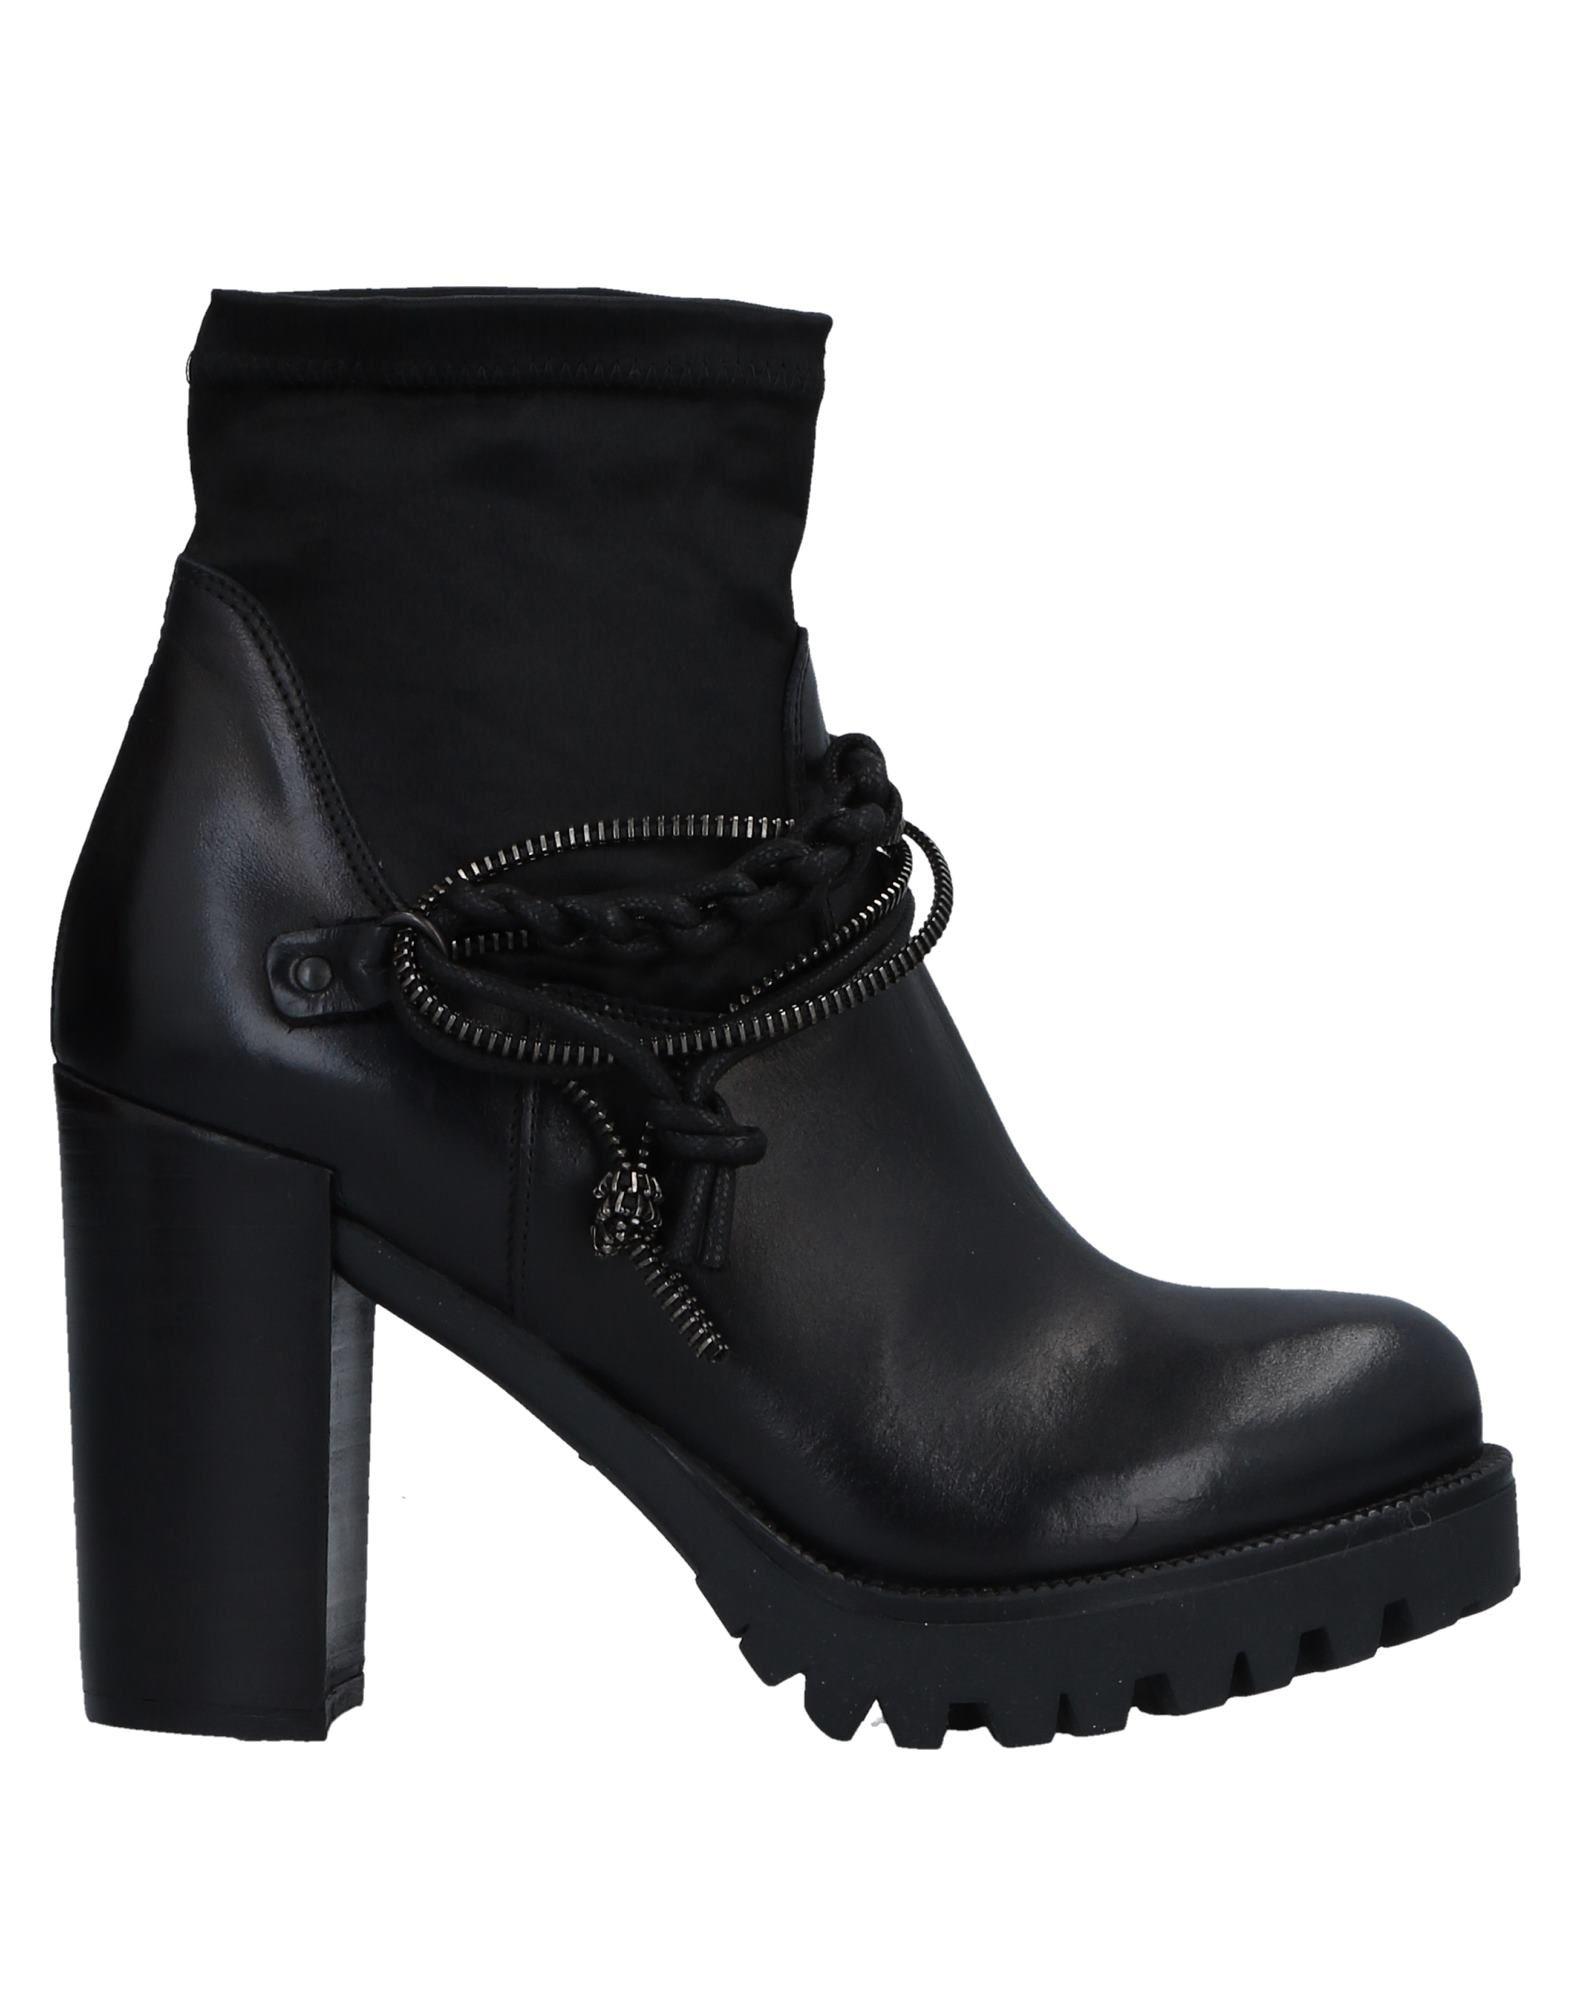 Gfg Creazioni Gfg Ankle Boot - Women Gfg Creazioni Creazioni Ankle Boots online on  United Kingdom - 11515979UM a53009